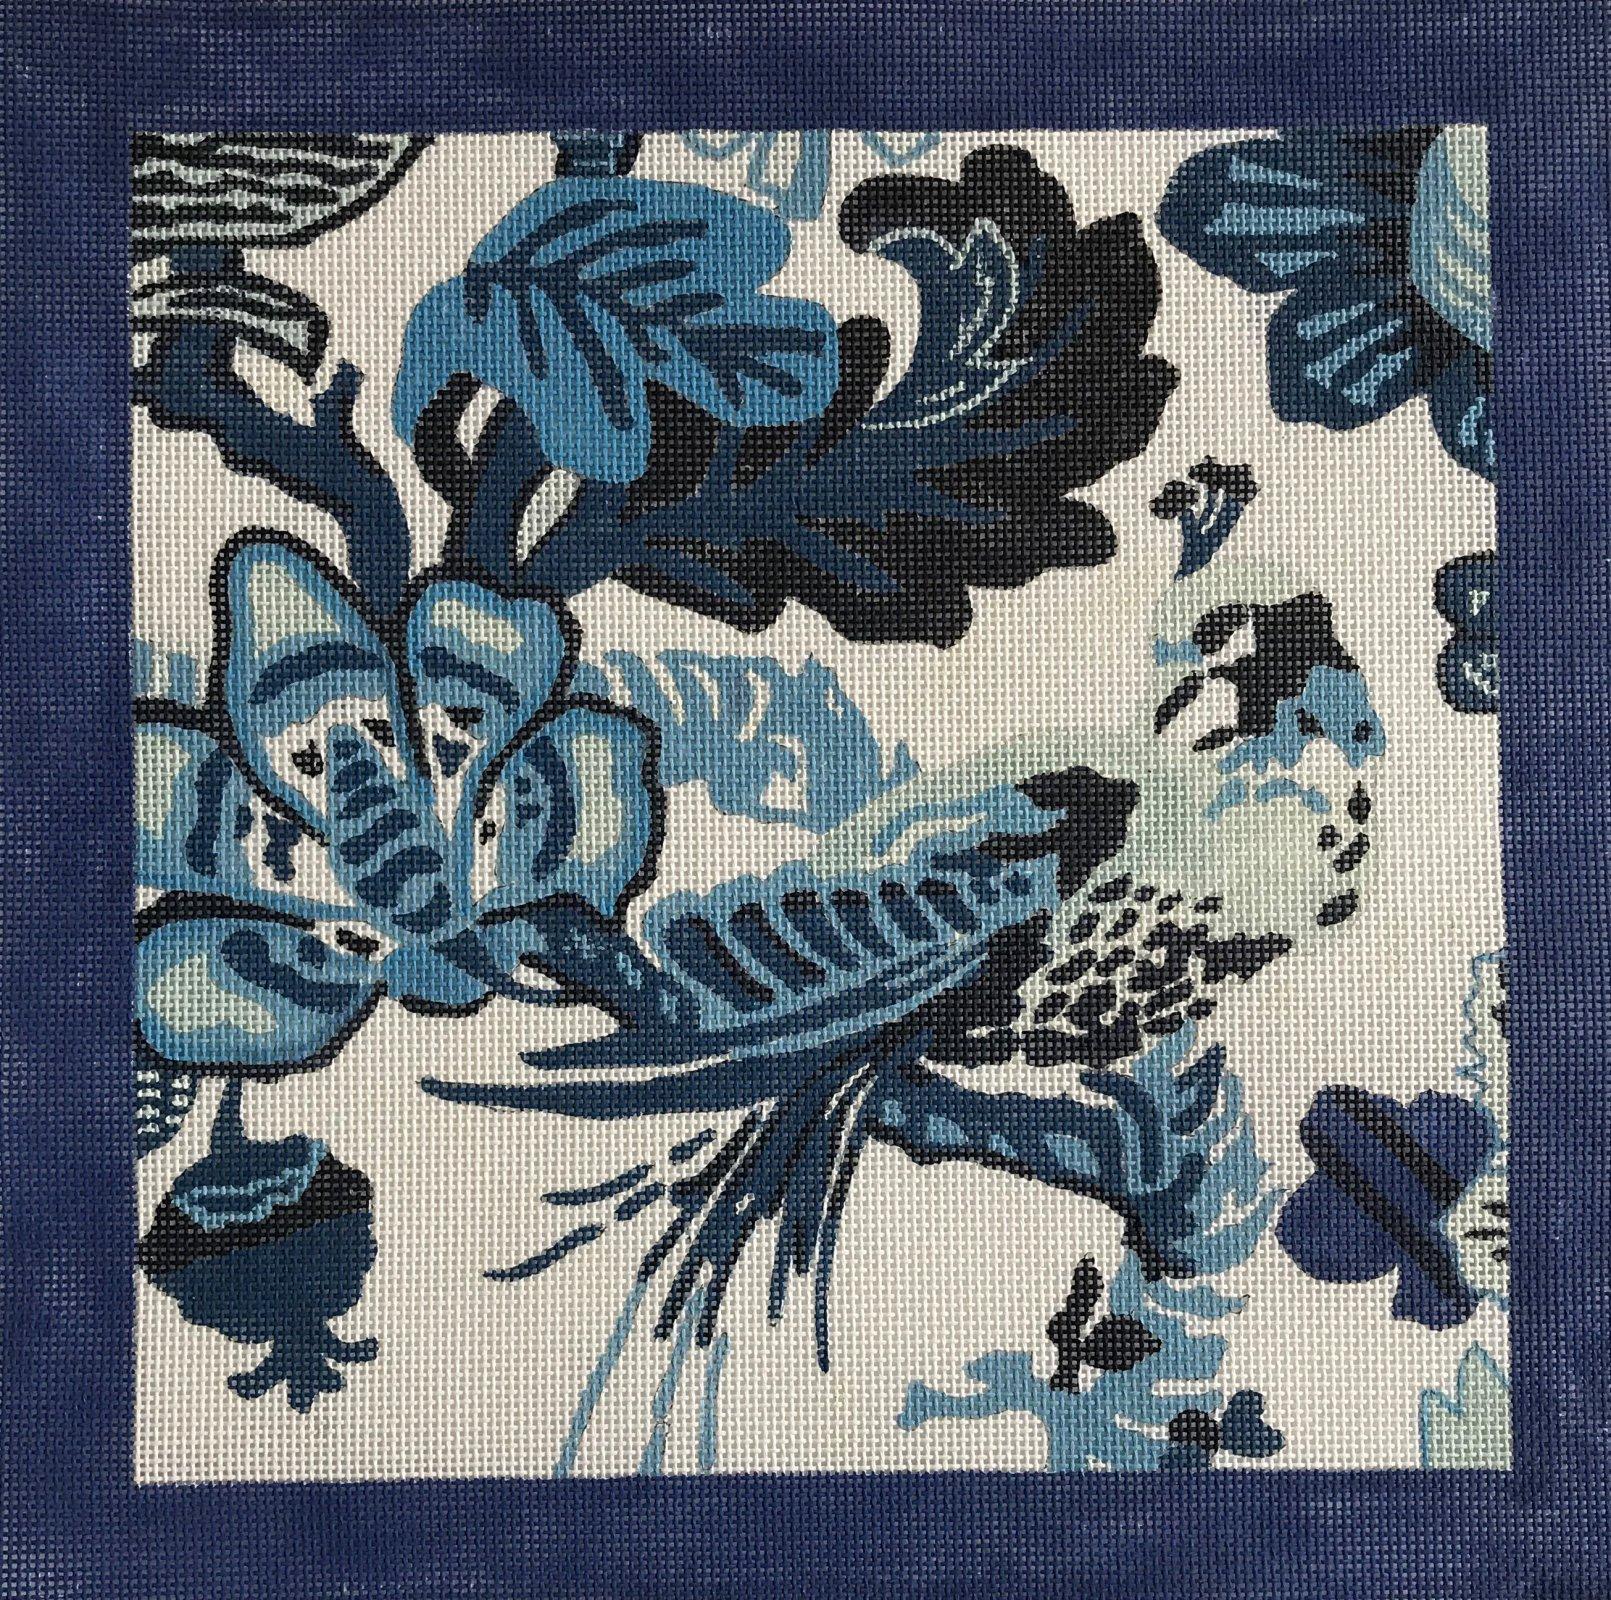 Blue Bird with Blue Border